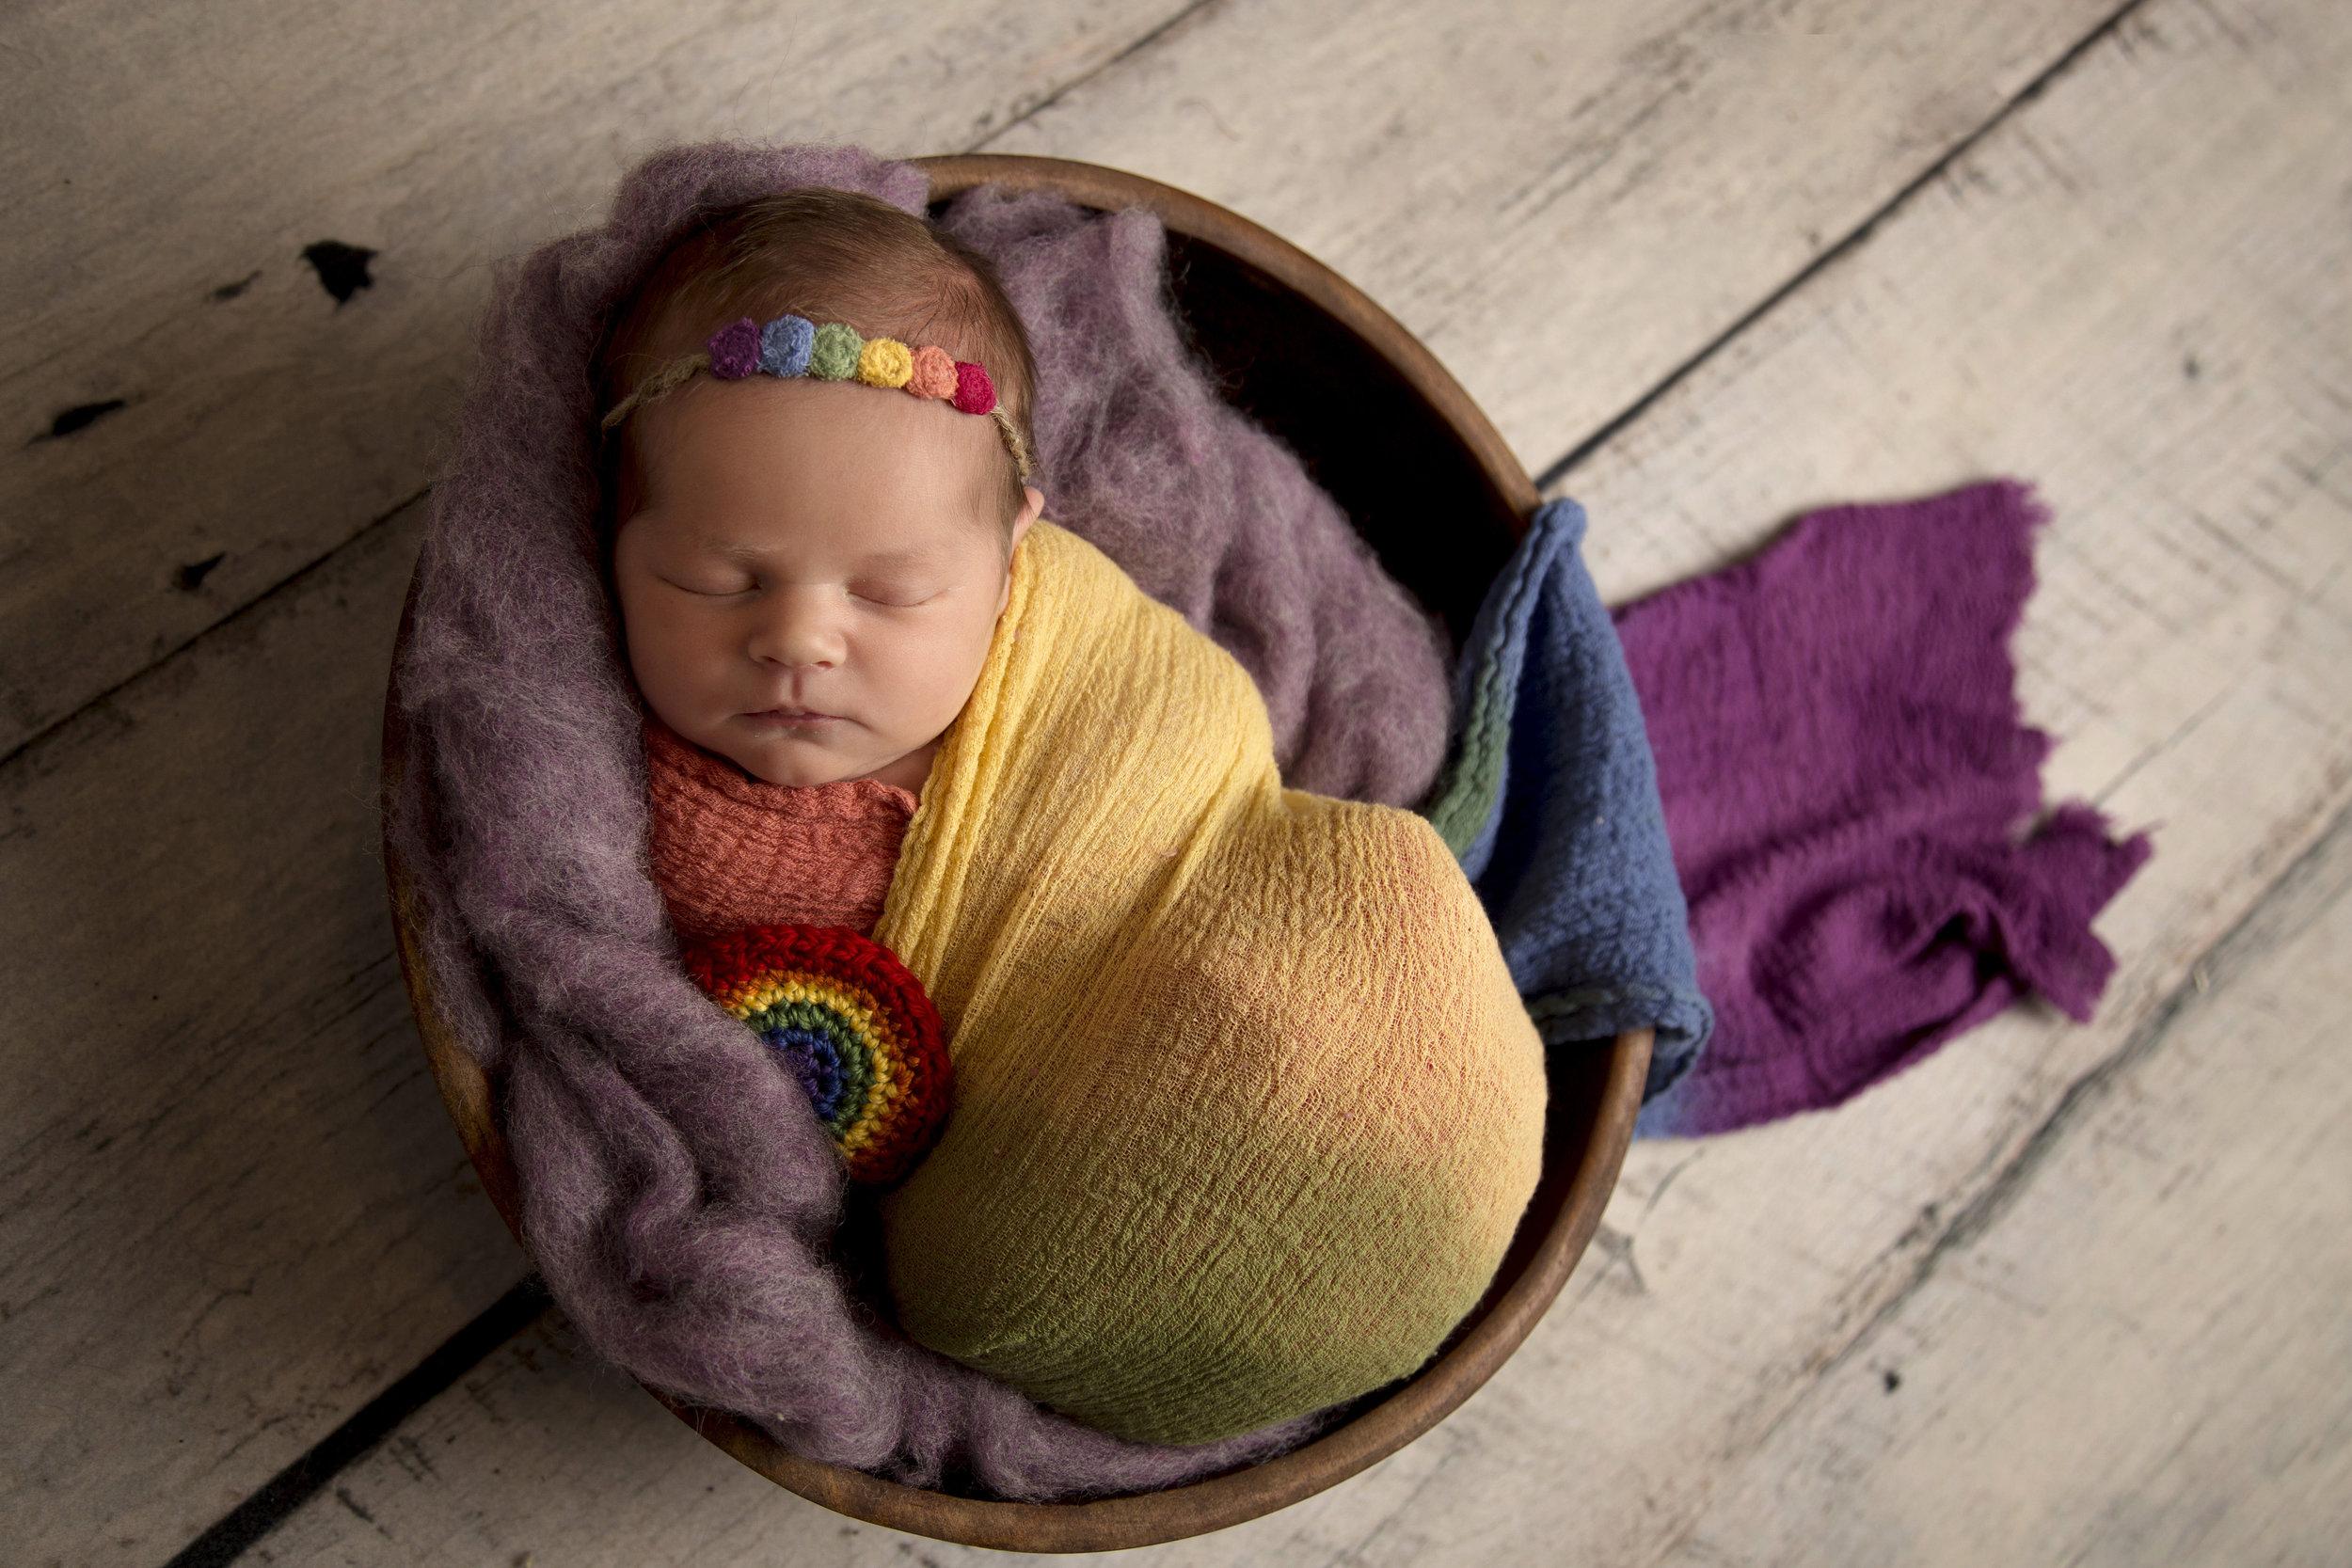 lancaster-newborn-photography-angie-englerth-aep012.jpg